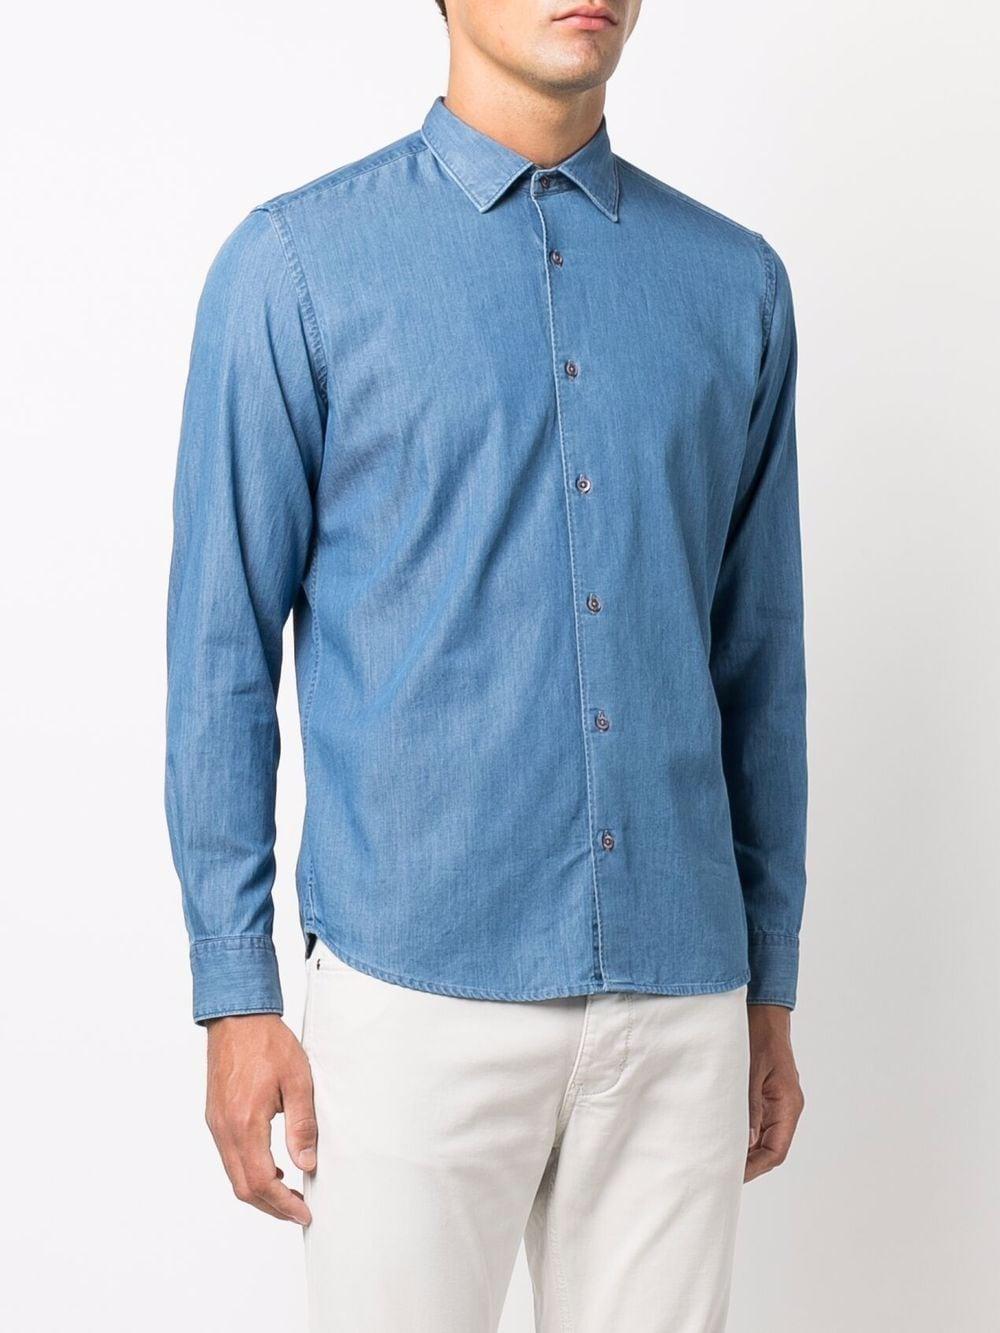 blue cotton button-up denim shirt  ALTEA |  | 216412312